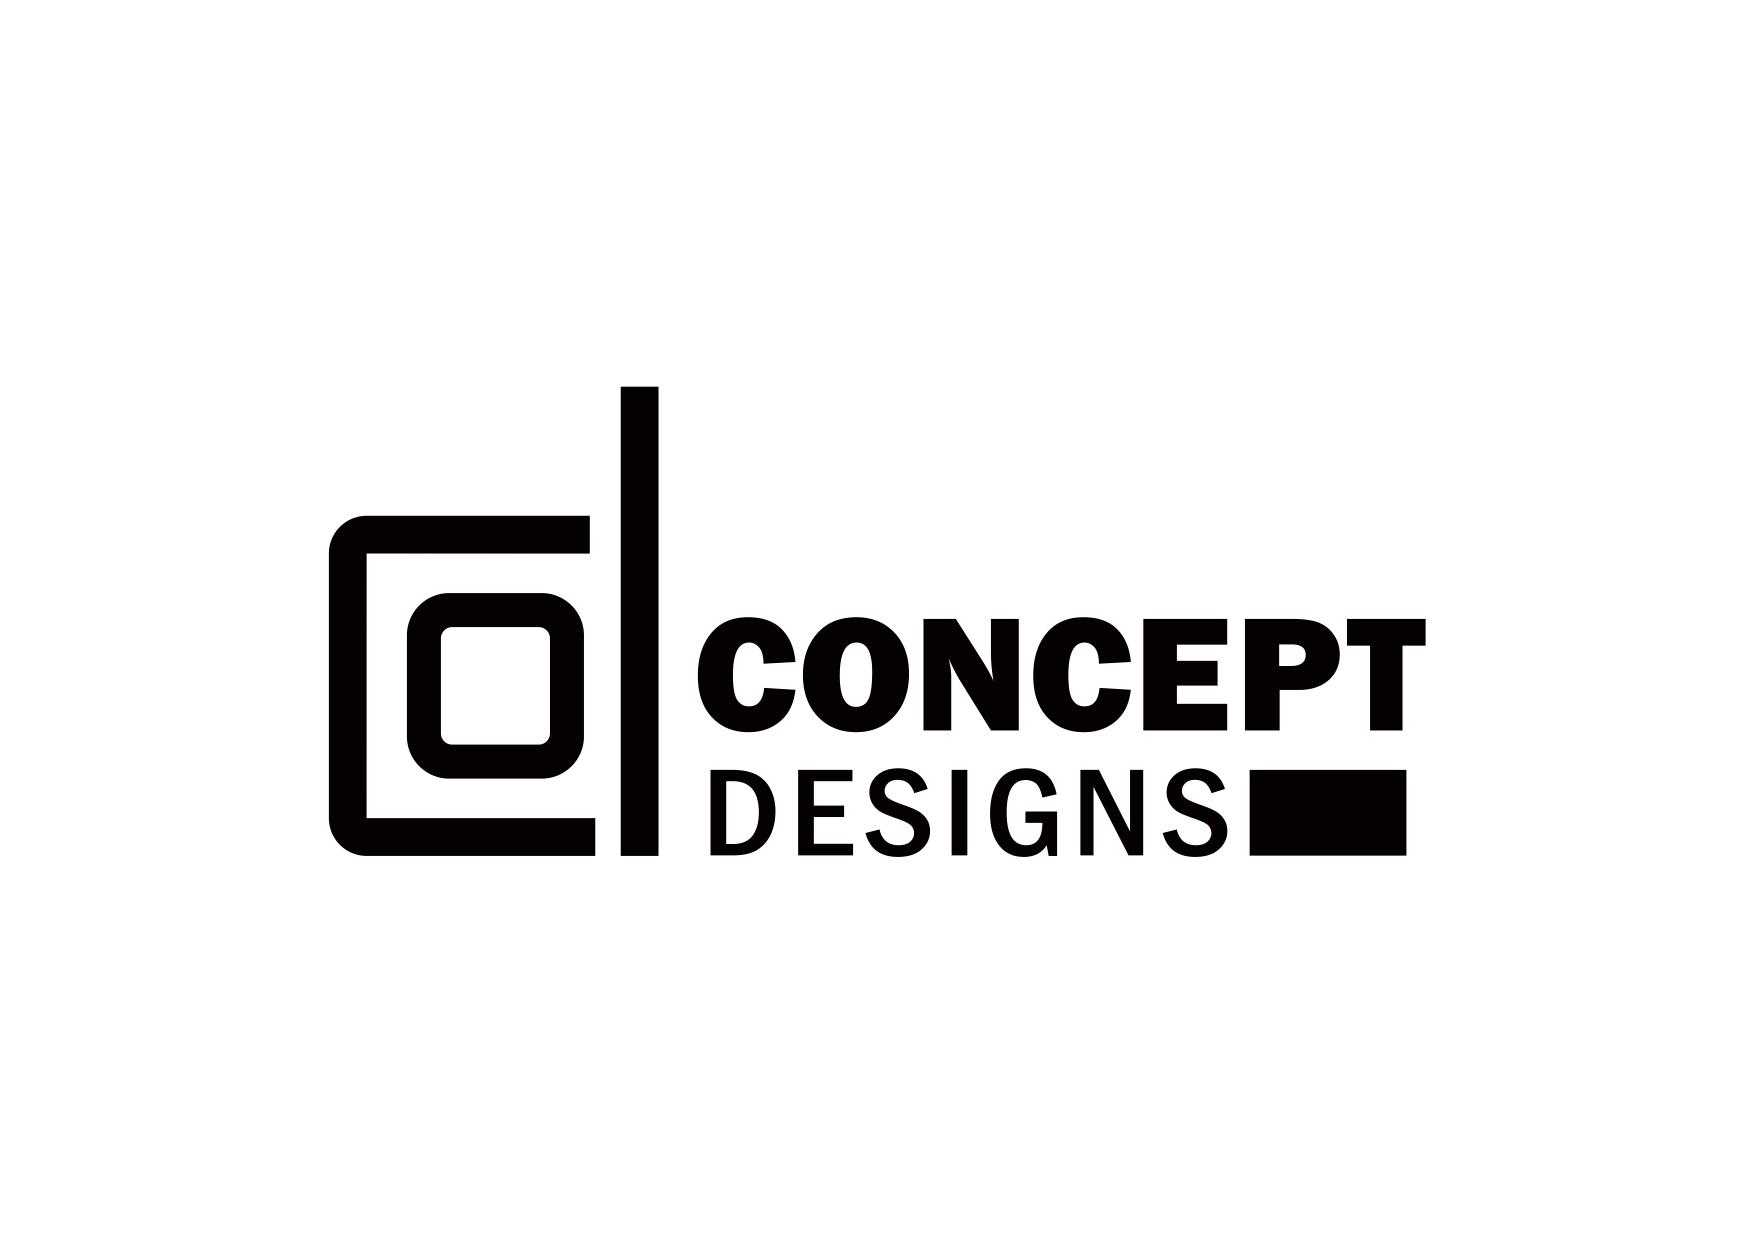 EG Concept